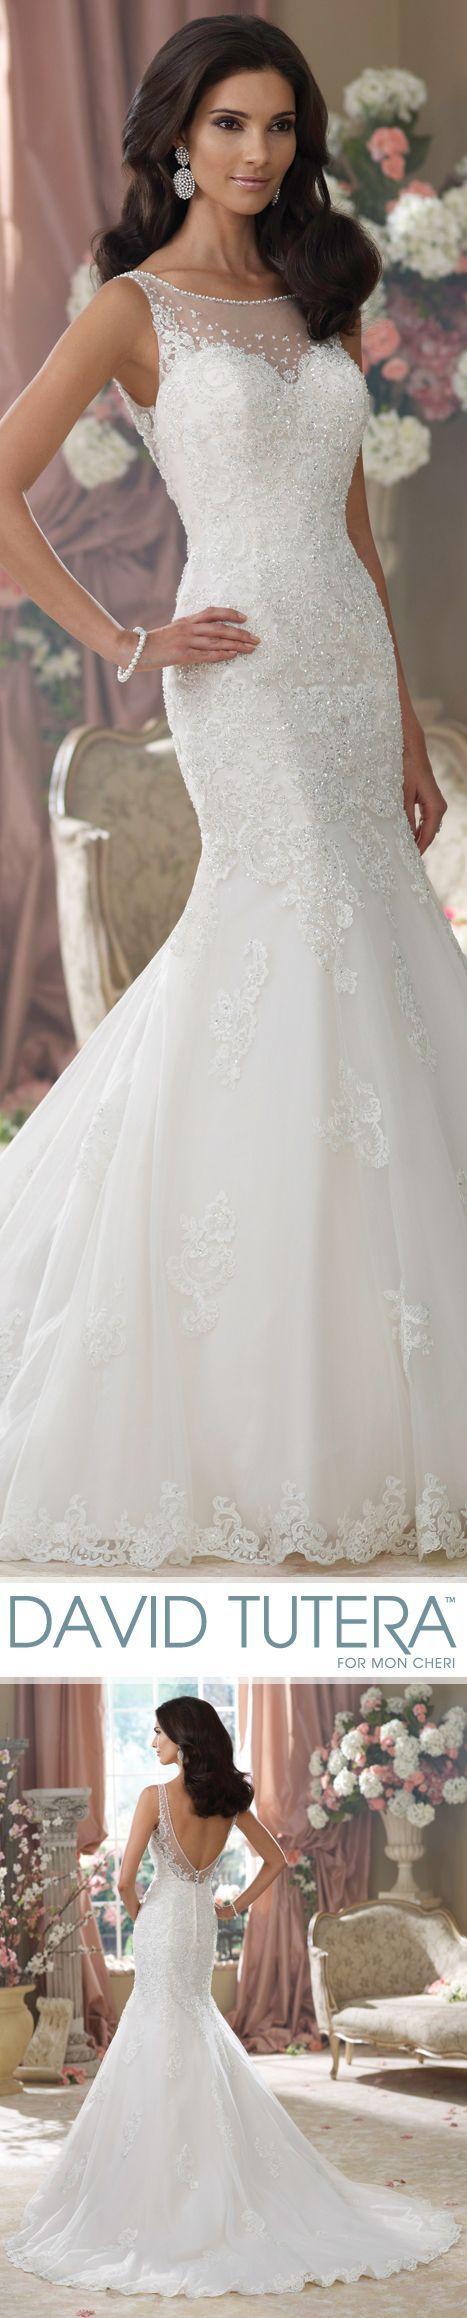 #Wedding                                                                                                                                                                                 More